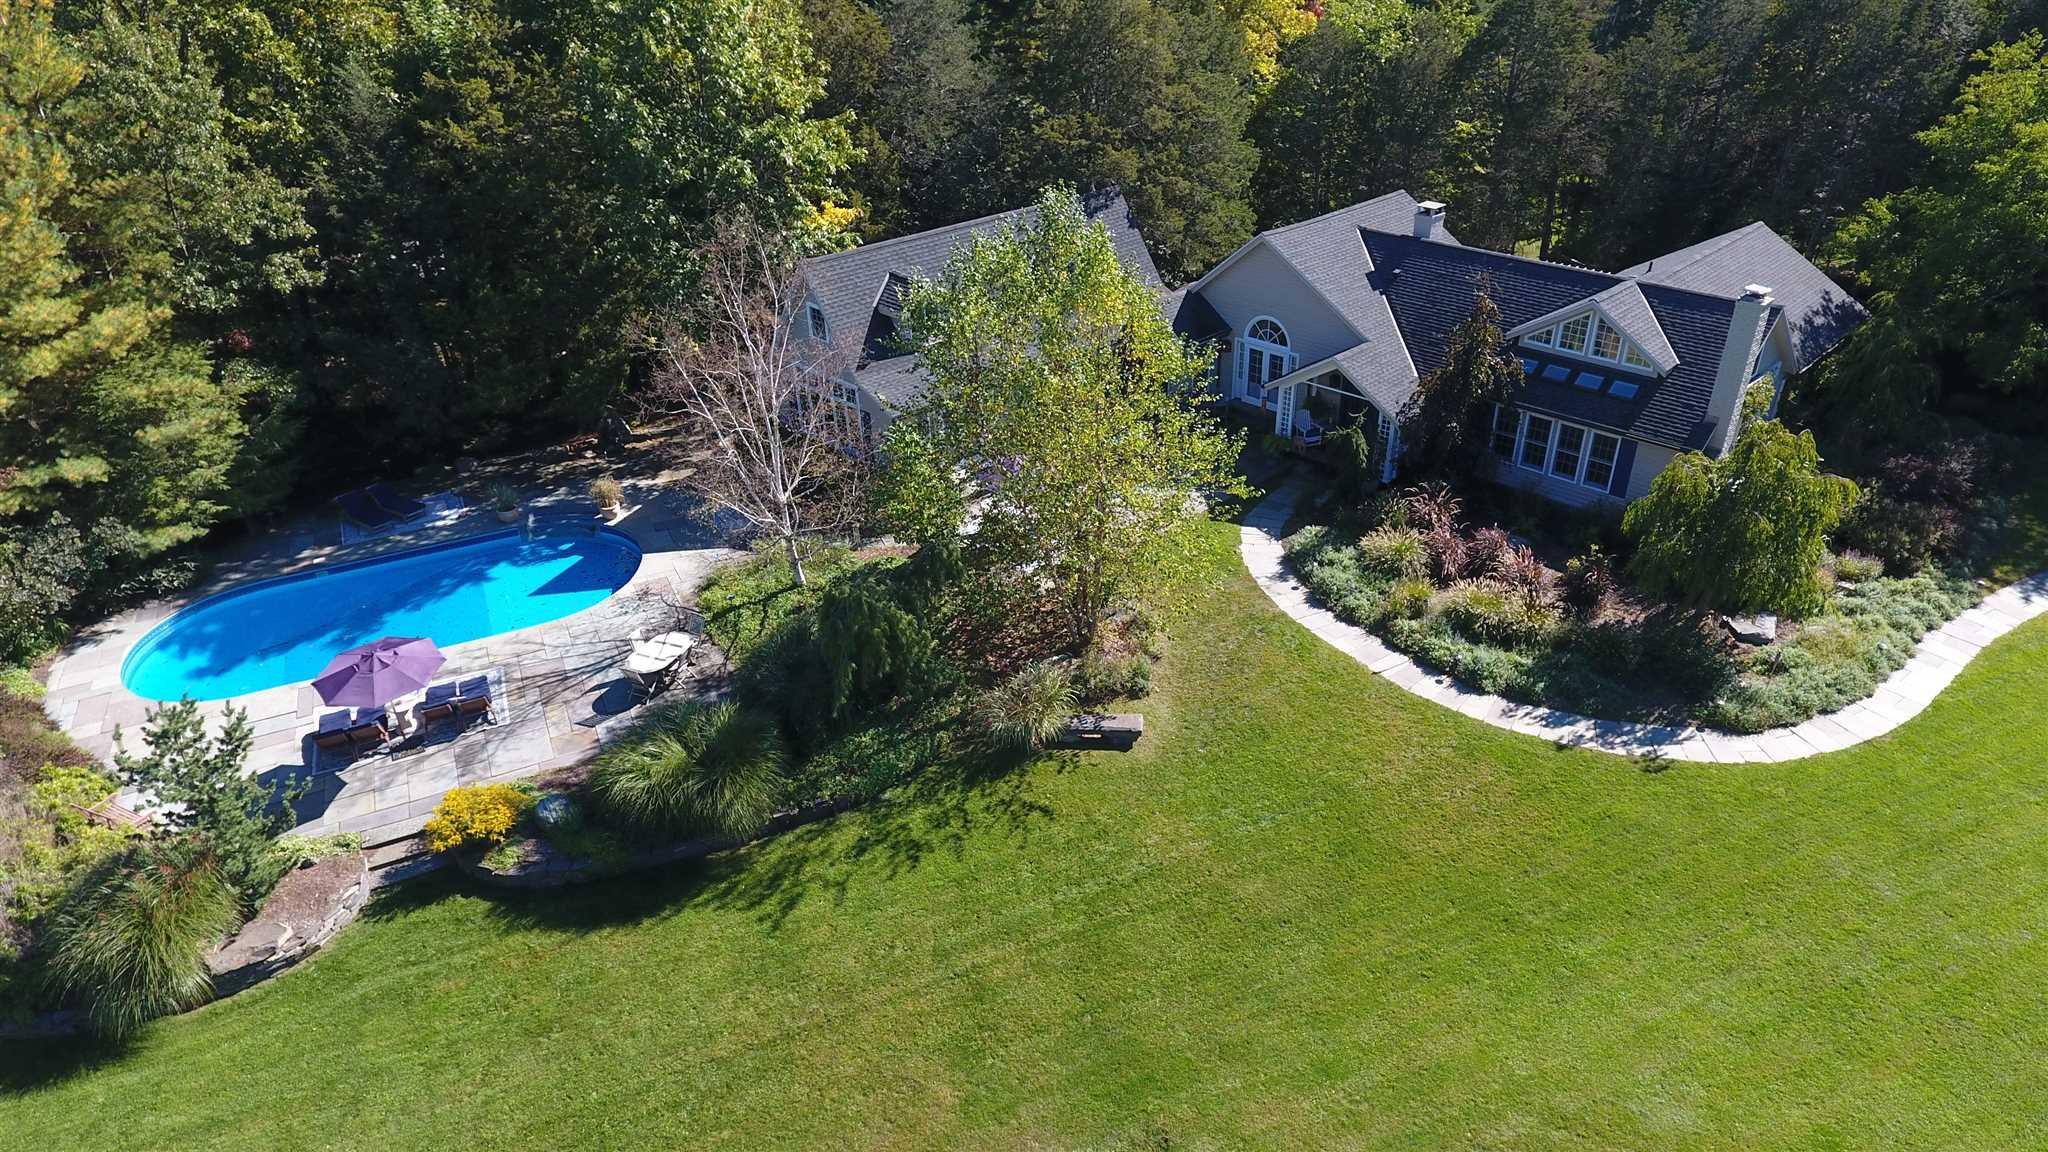 Single Family Home for Sale at MOUNTAIN LAUREL LANE MOUNTAIN LAUREL LANE Woodstock, New York 12477 United States